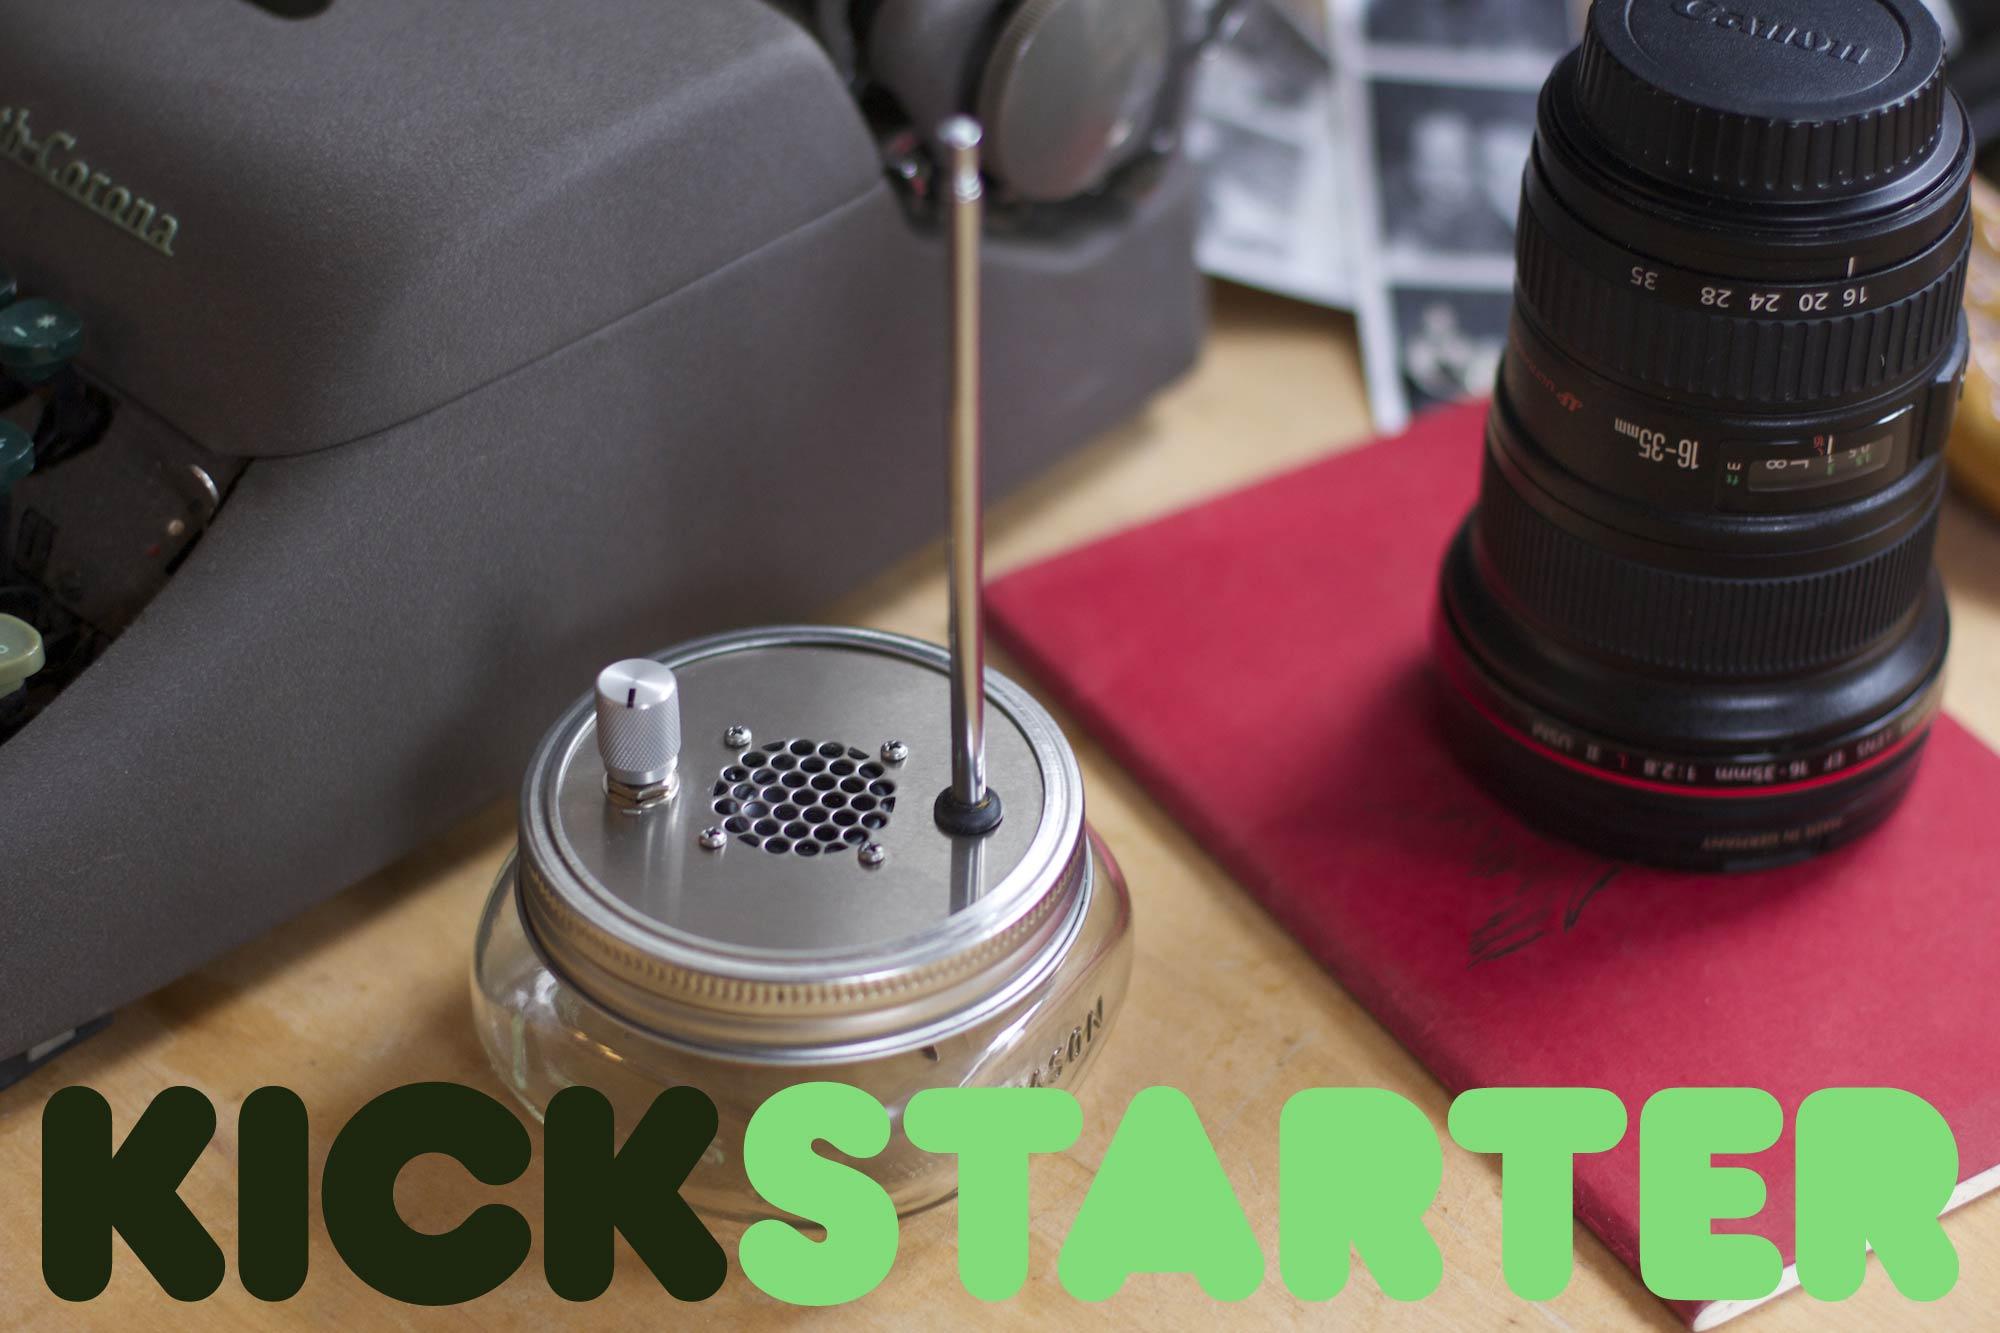 Typewritter and Kickstarter.jpg